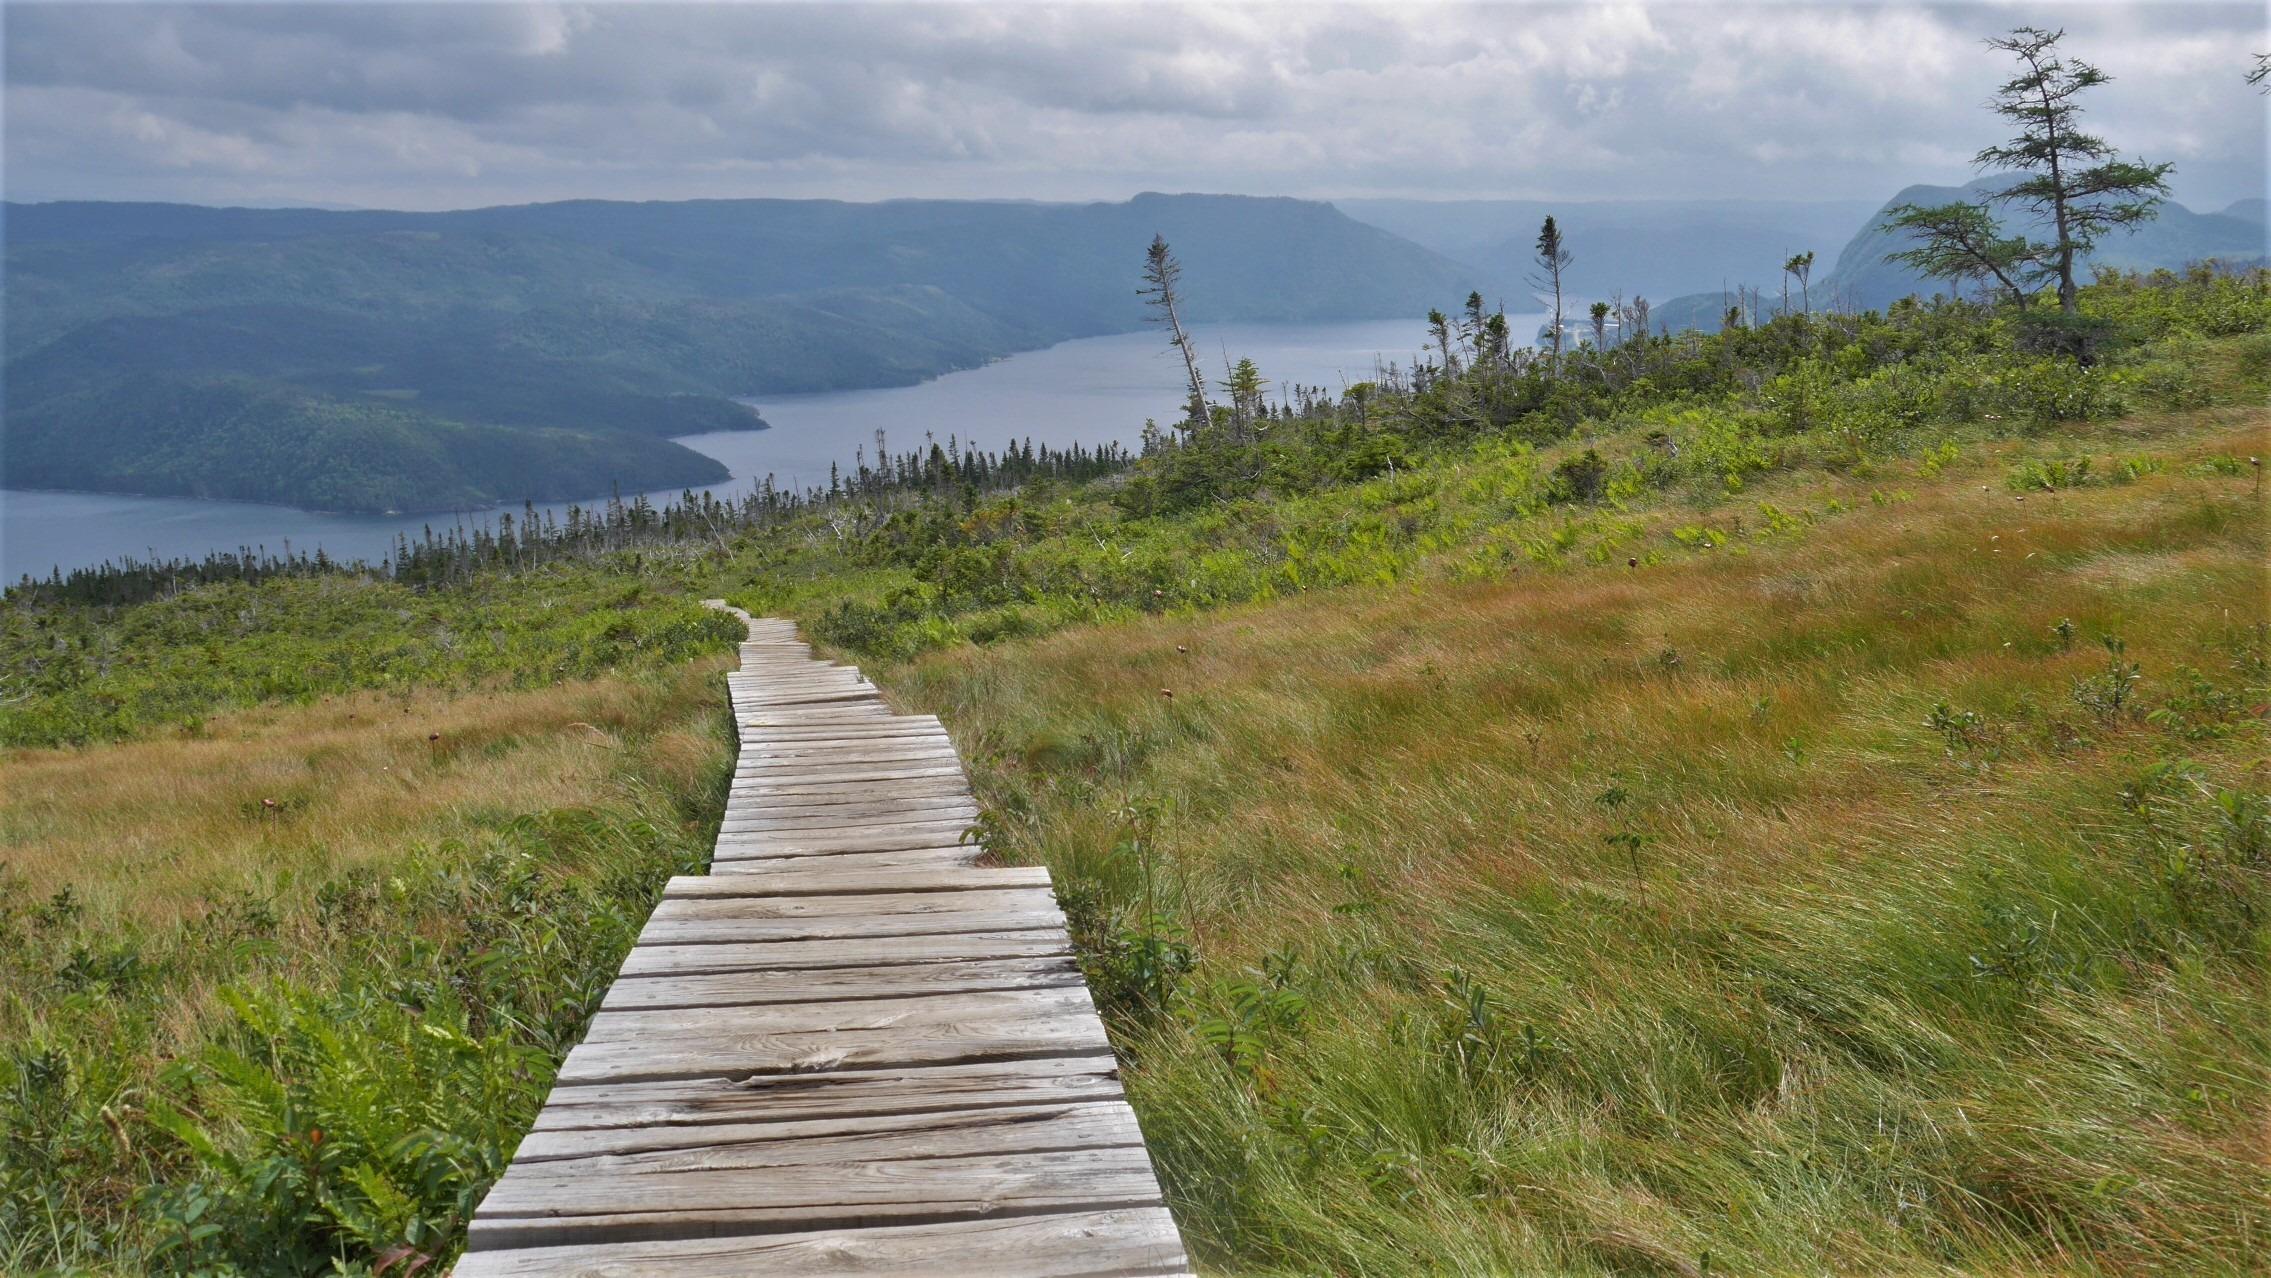 Terre-Neuve randonnée sentiers parc national Gros-Morne Canada